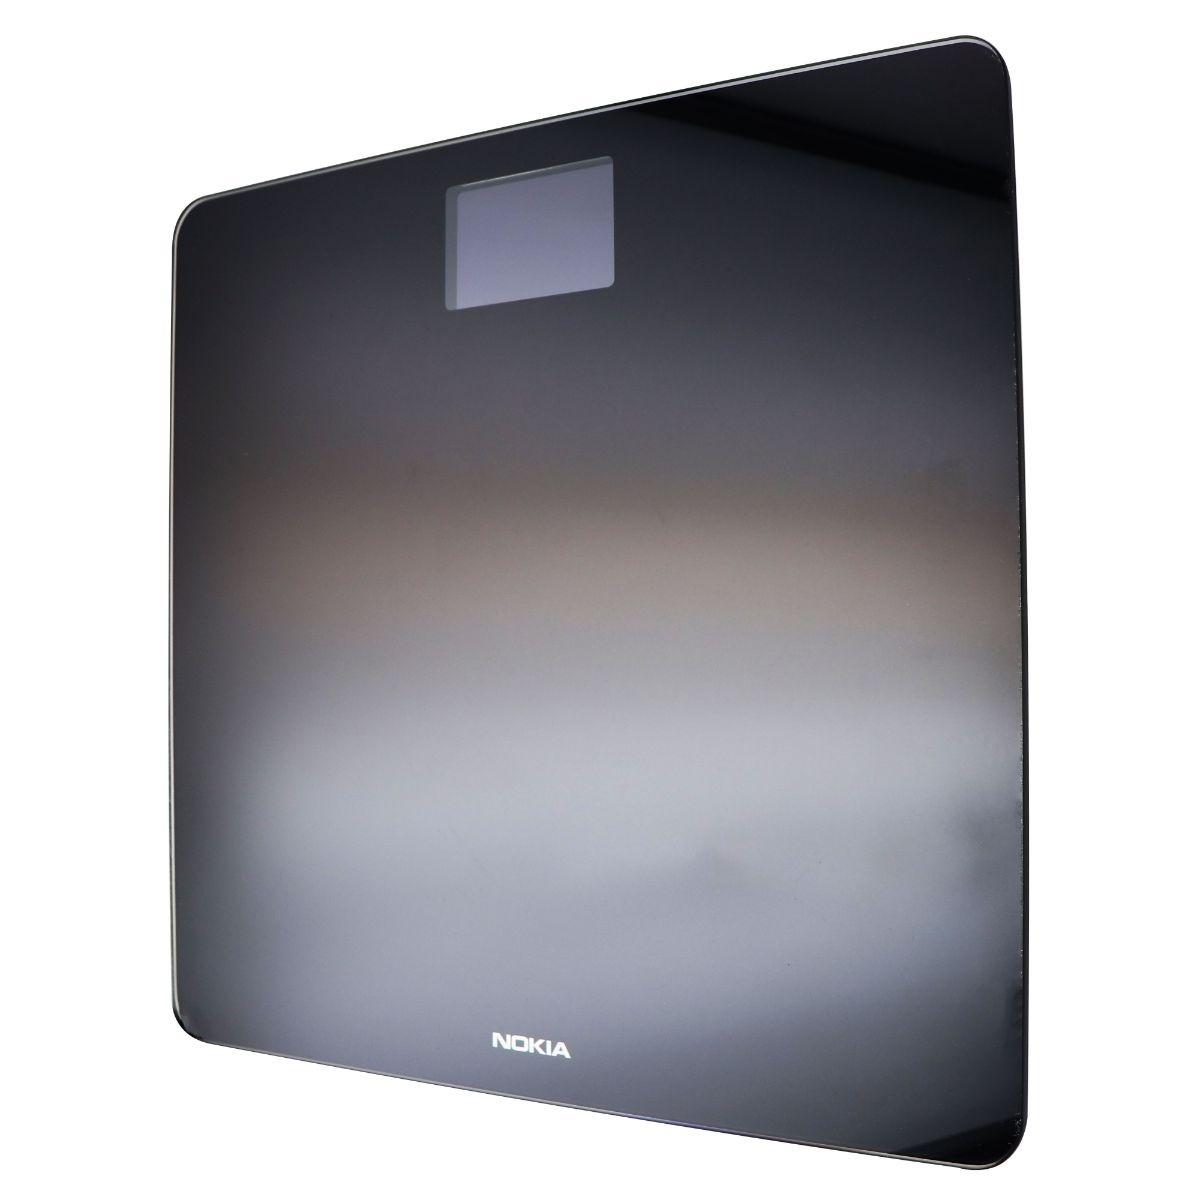 Withings Body - Smart Weight & BMI Wi-Fi Digital Scale w/ Smartphone App - Black